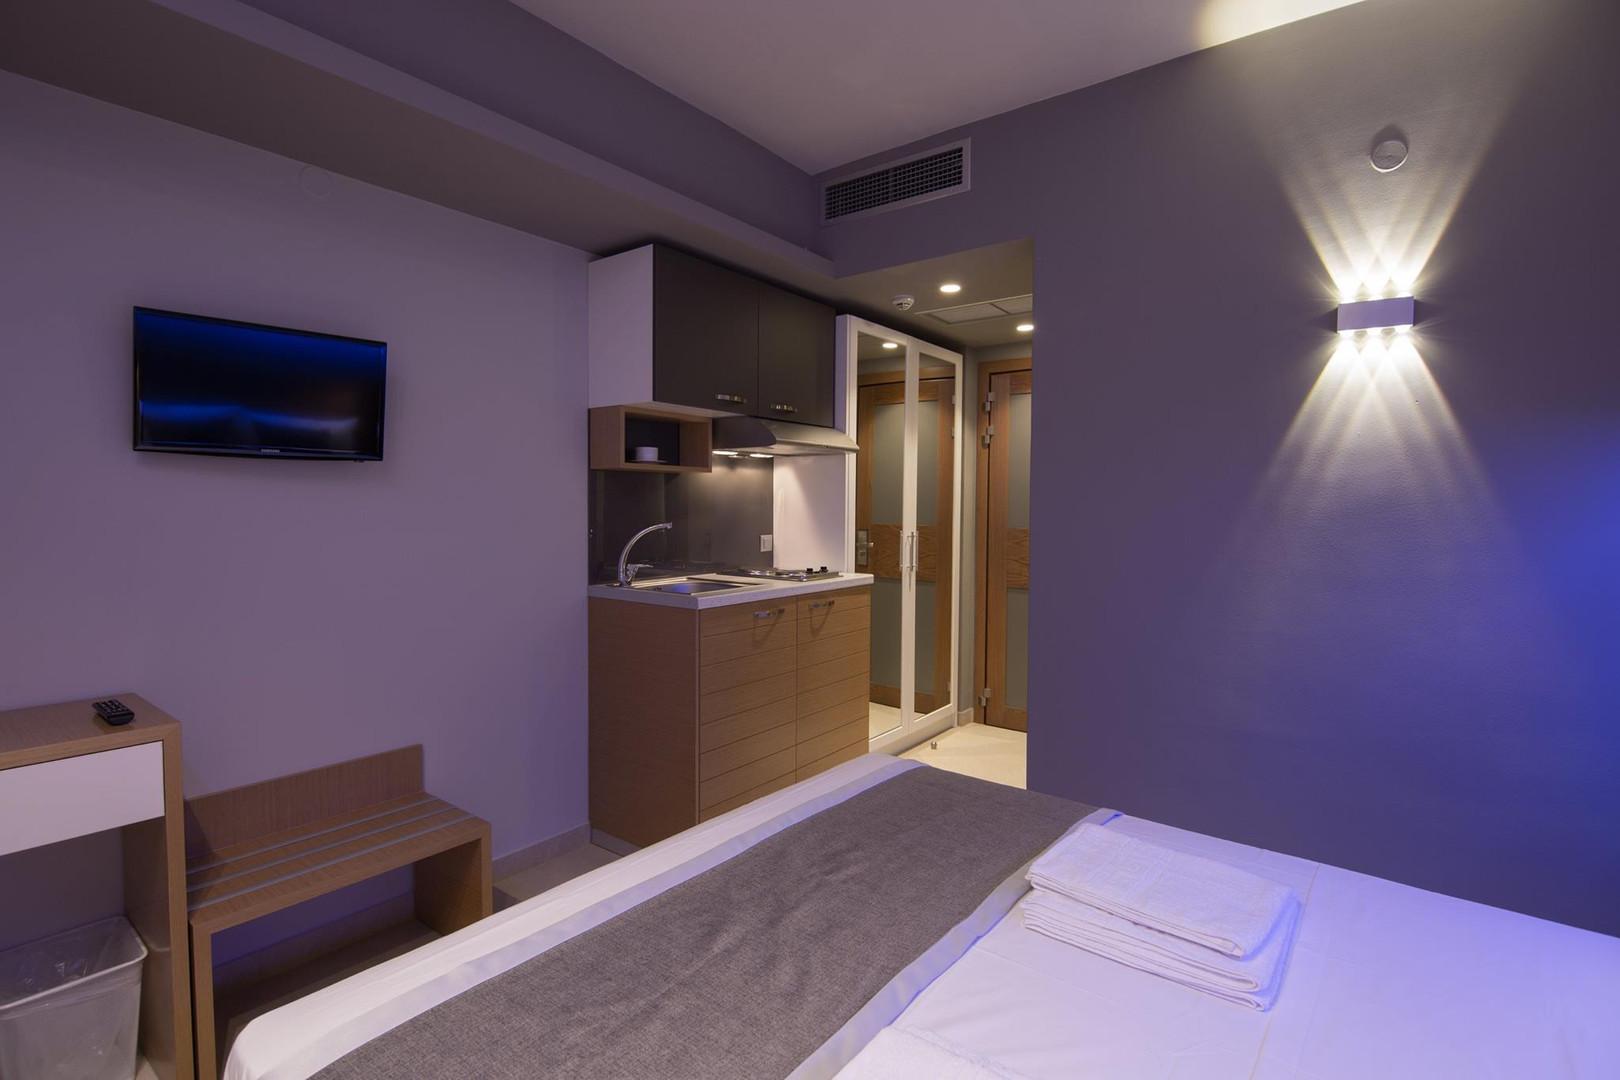 4 SKS Hotel, Βαλιτσοθήκη έπιπλο τουαλέτα